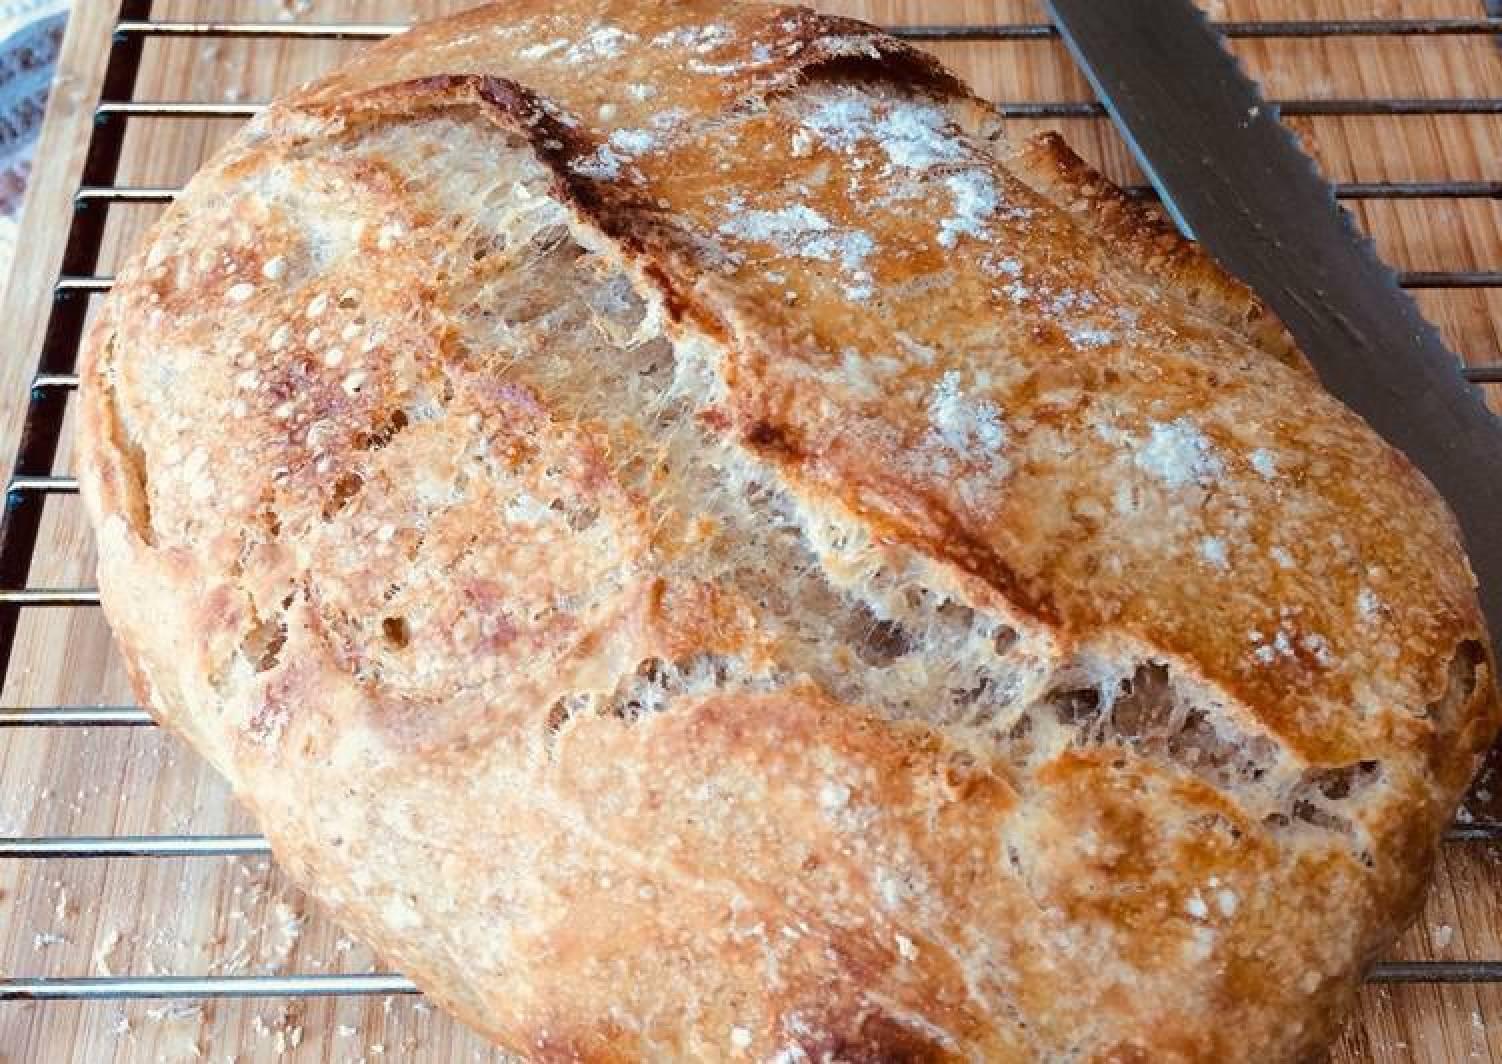 Sourdough bread levain (starter)